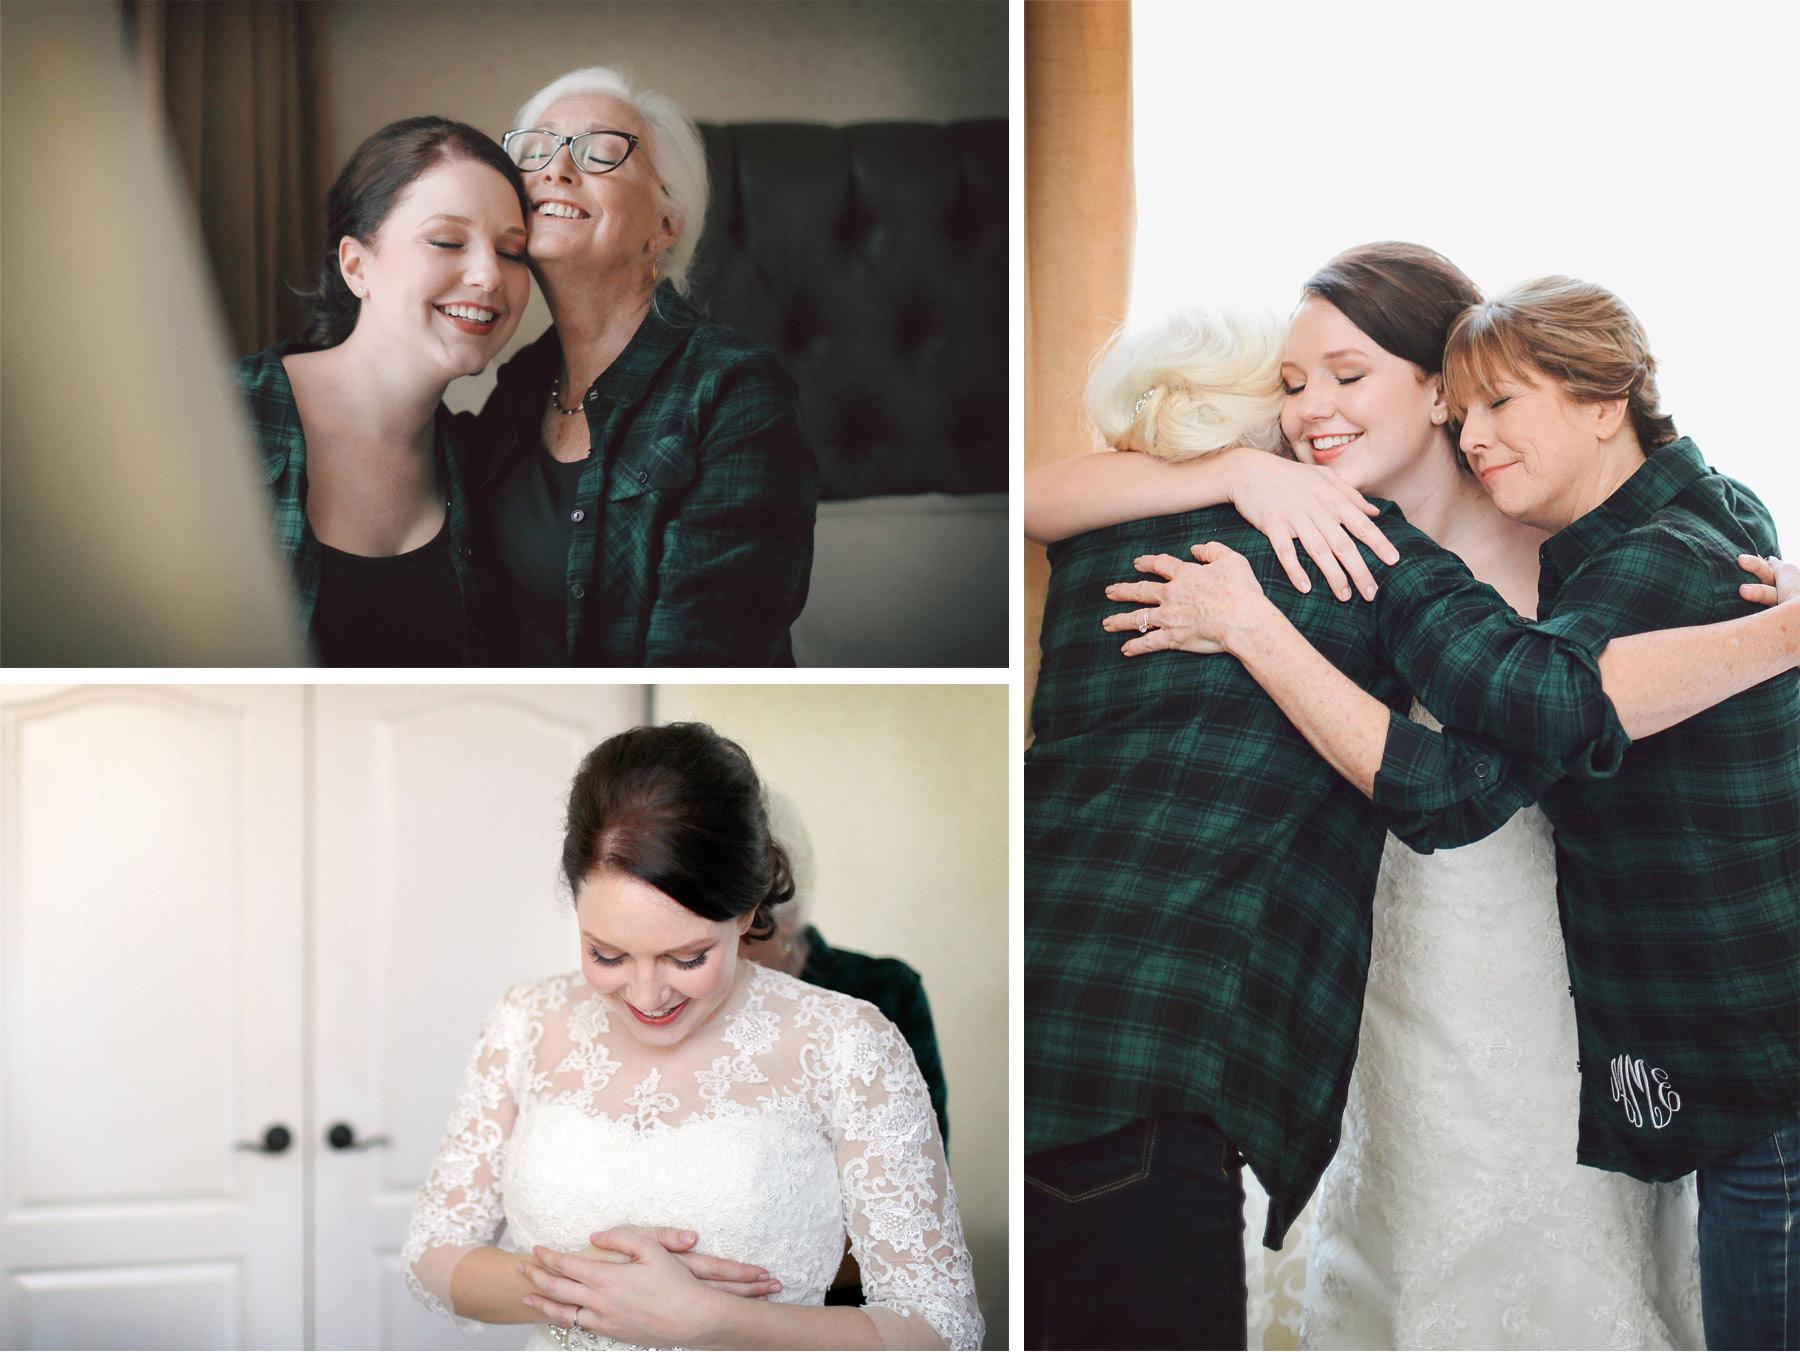 01-Minneapolis-Minnesota-Wedding-Photographer-by-Andrew-Vick-Photography-Winter-Renaissance-Hotel-Getting-Ready-Bride-Mother-Parents-Dress-Hug-Embrace-Sara-and-Rob.jpg